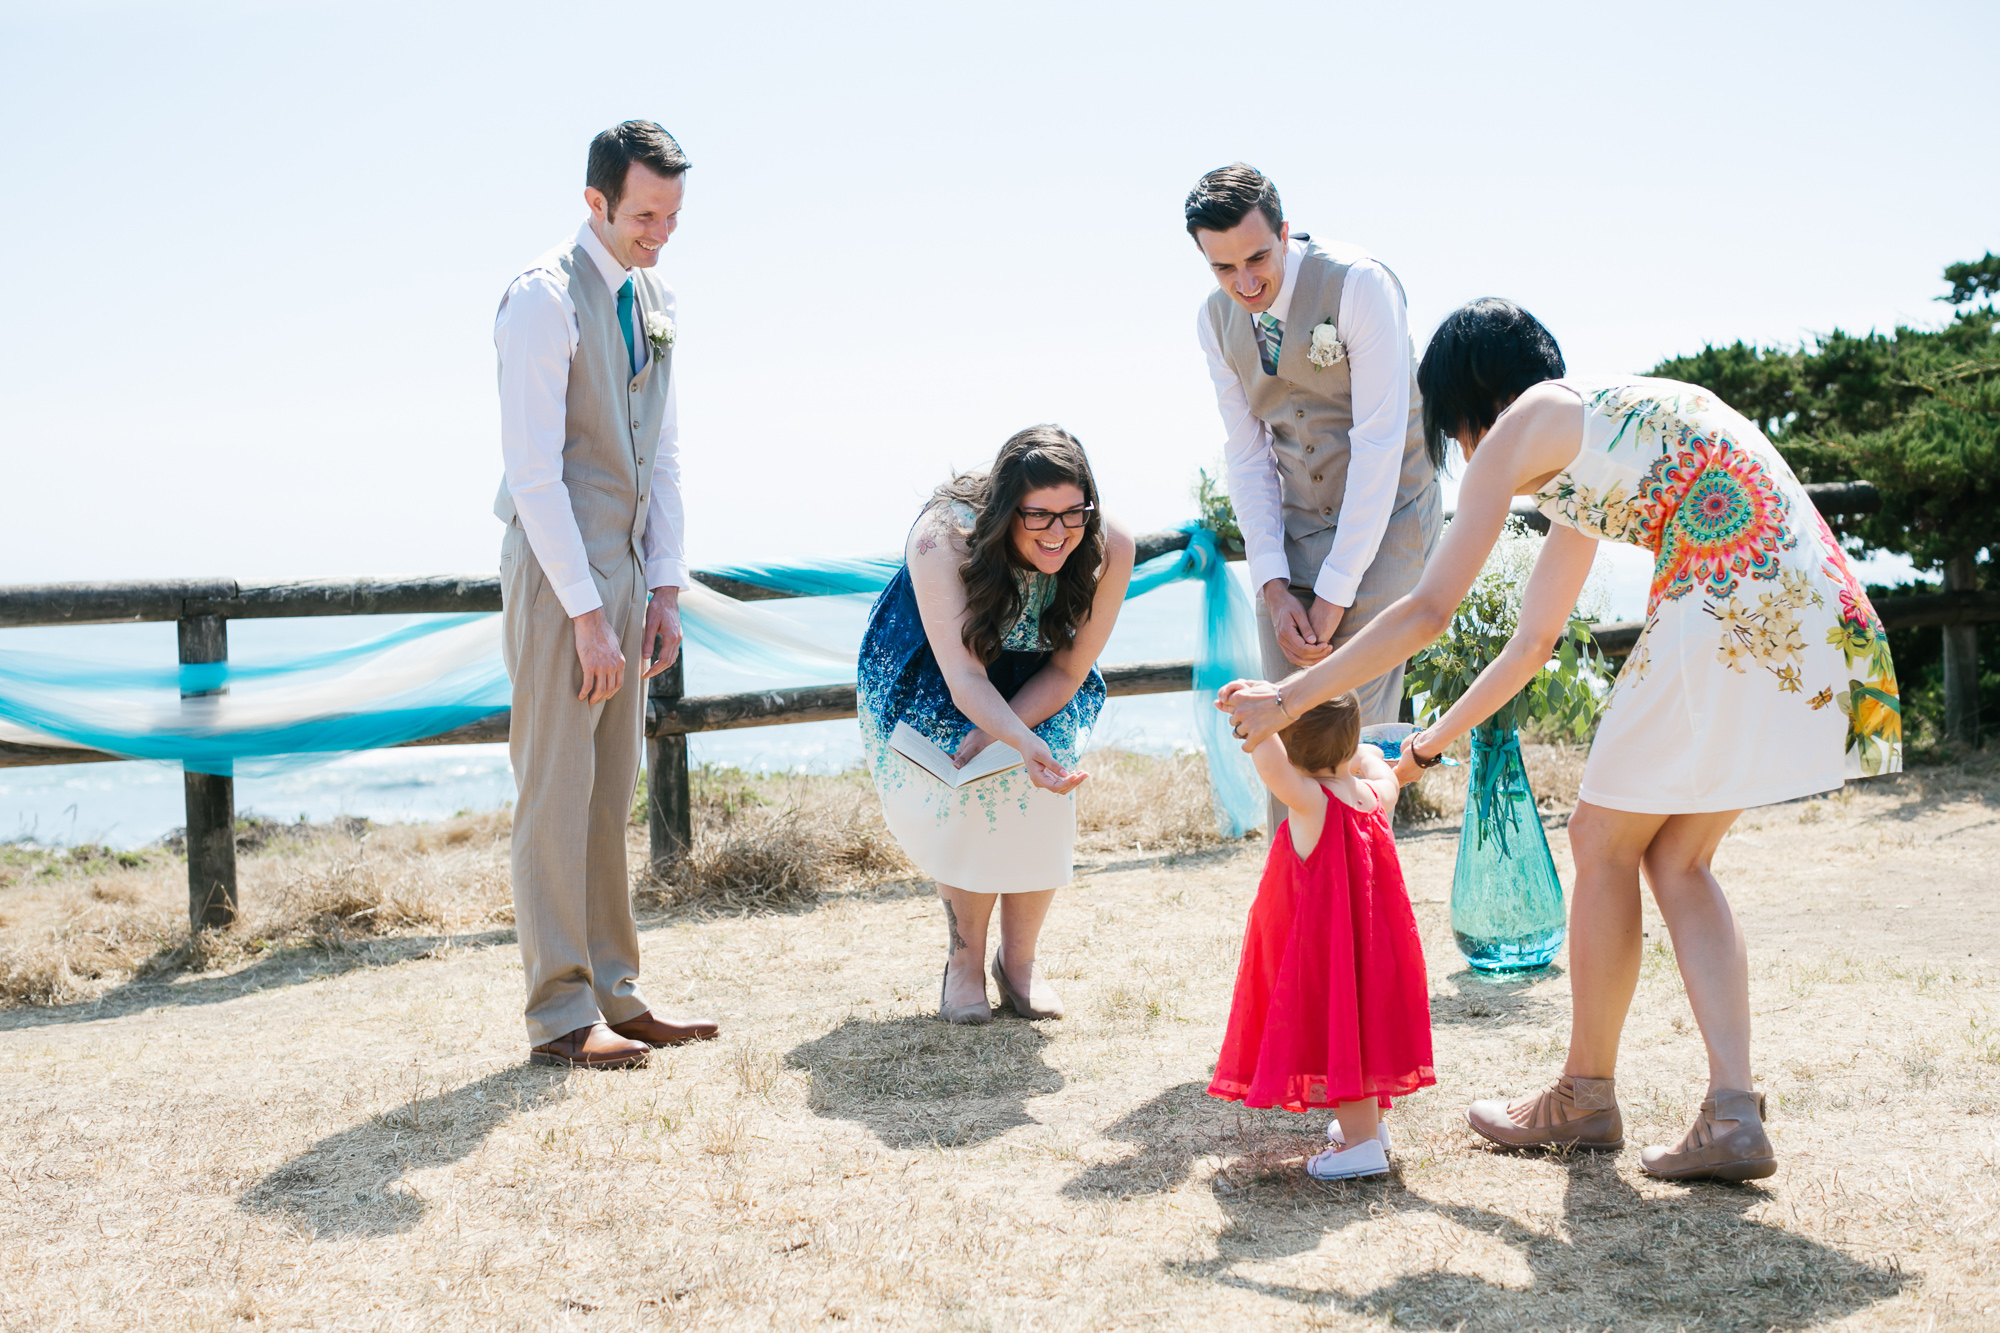 15_Cambria_wedding_samesex_coastal_intimate_Central_Coast_beach.jpg